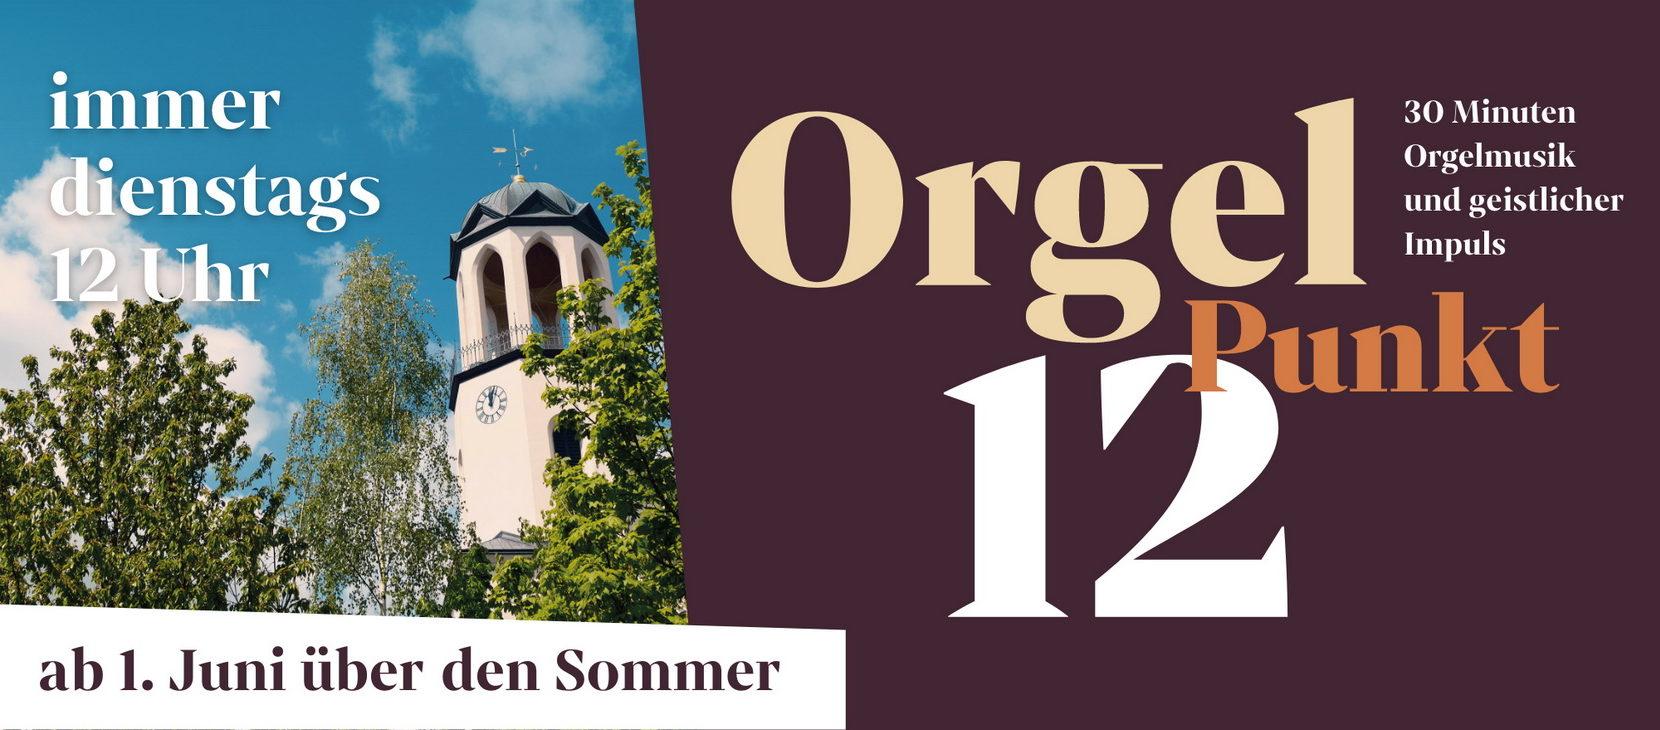 Orgel Punkt 12